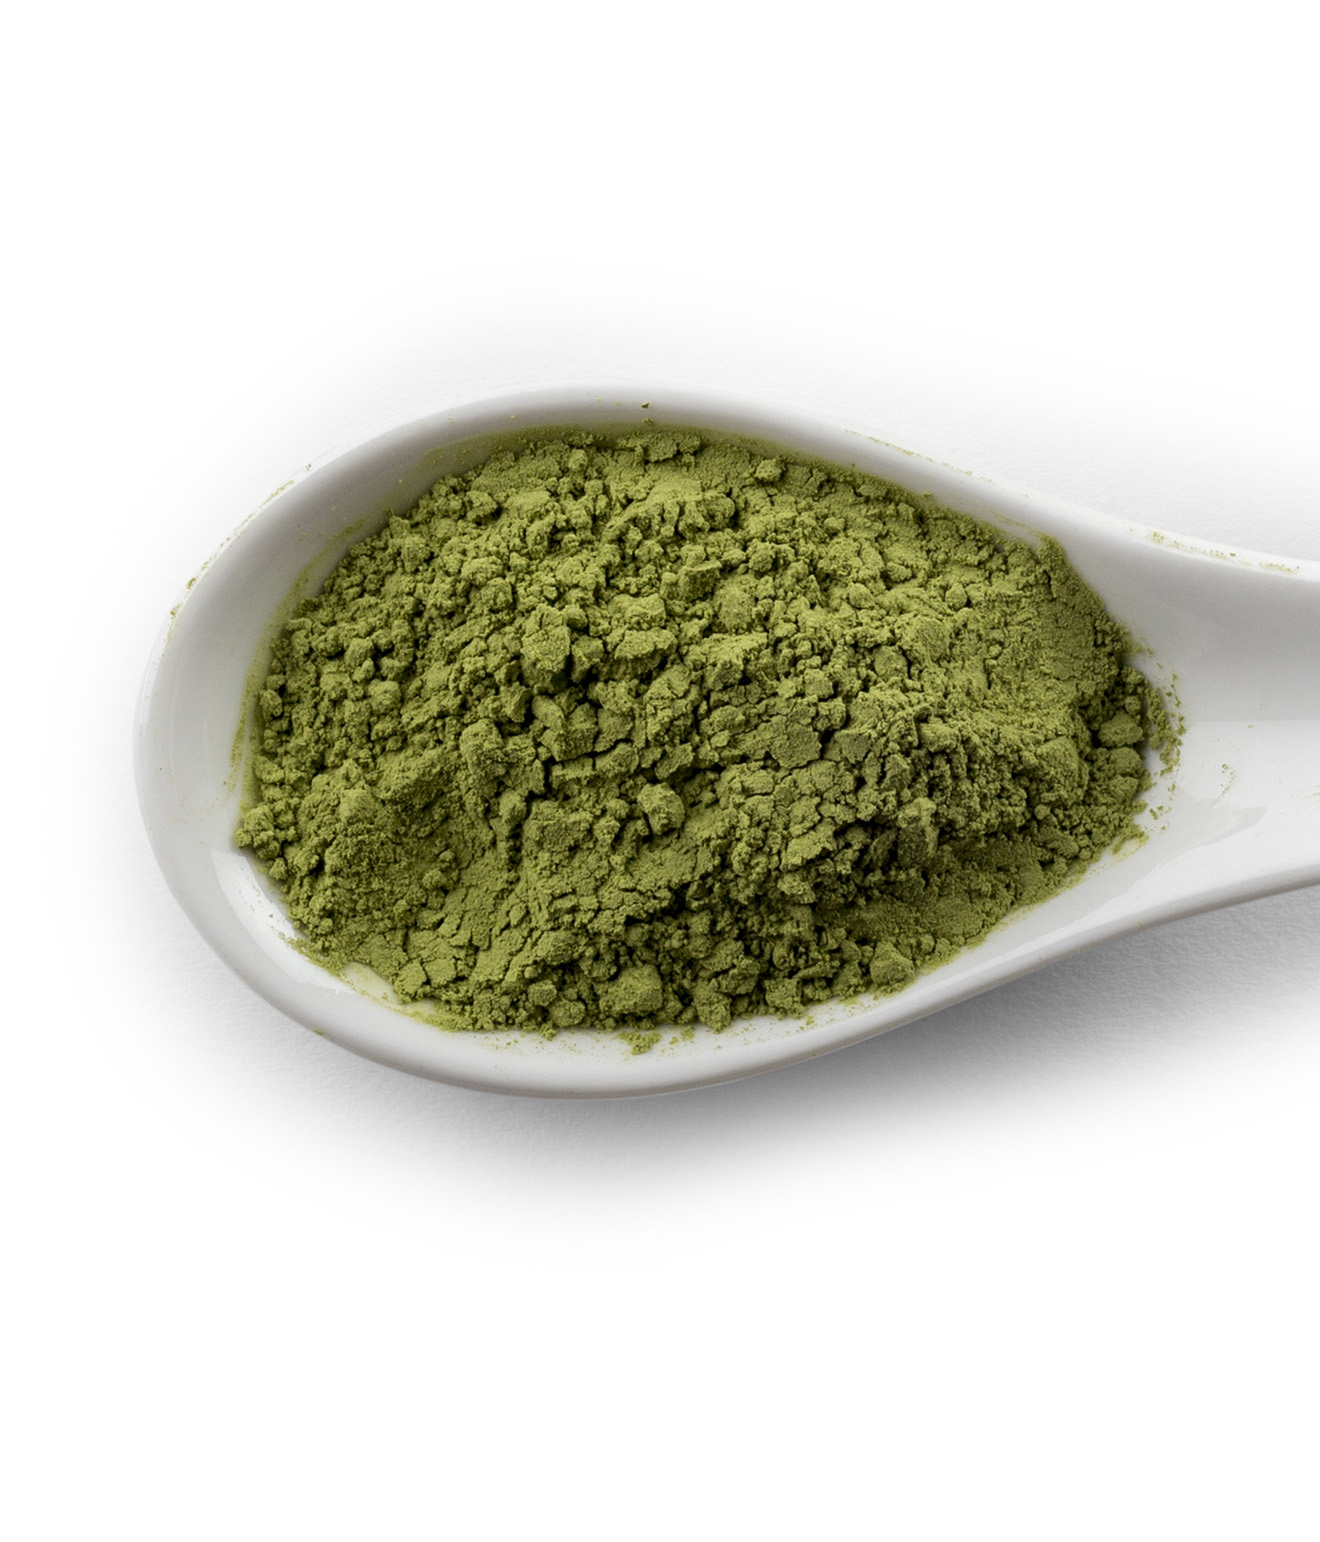 The Health Benefits Of Drinking Matcha Tea